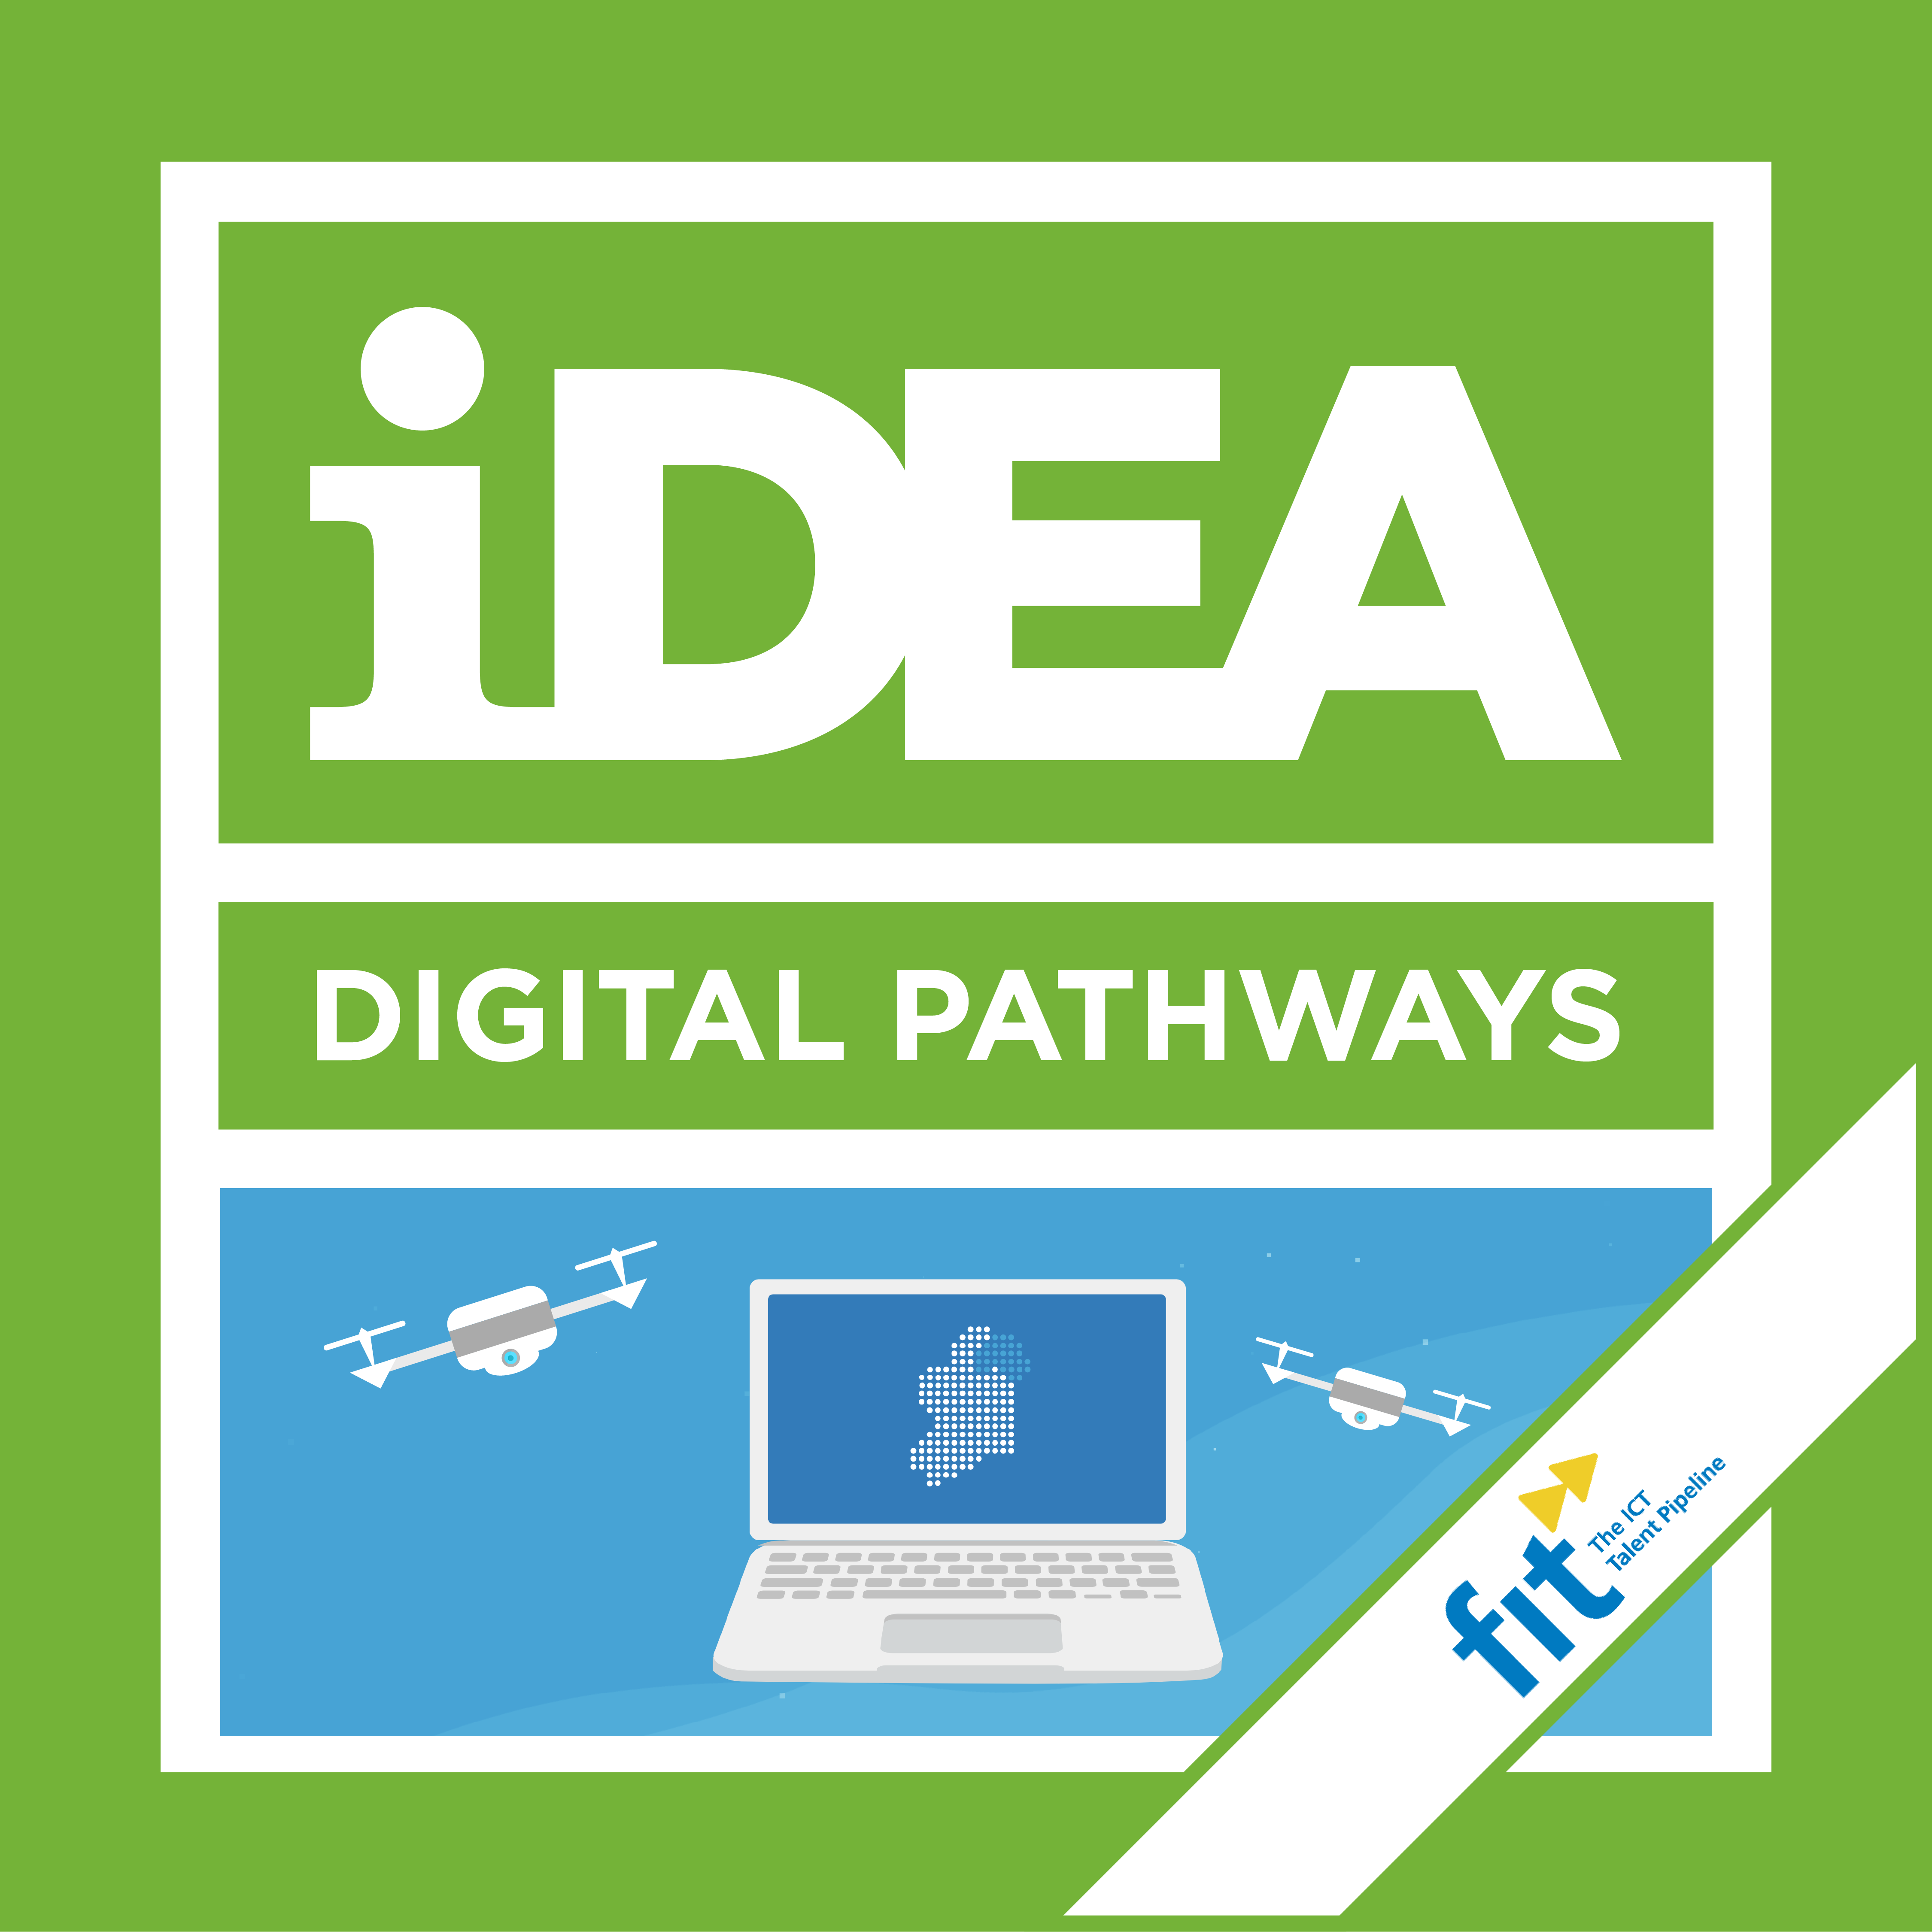 NEW iDEA Bronze Badge: Digital Pathways